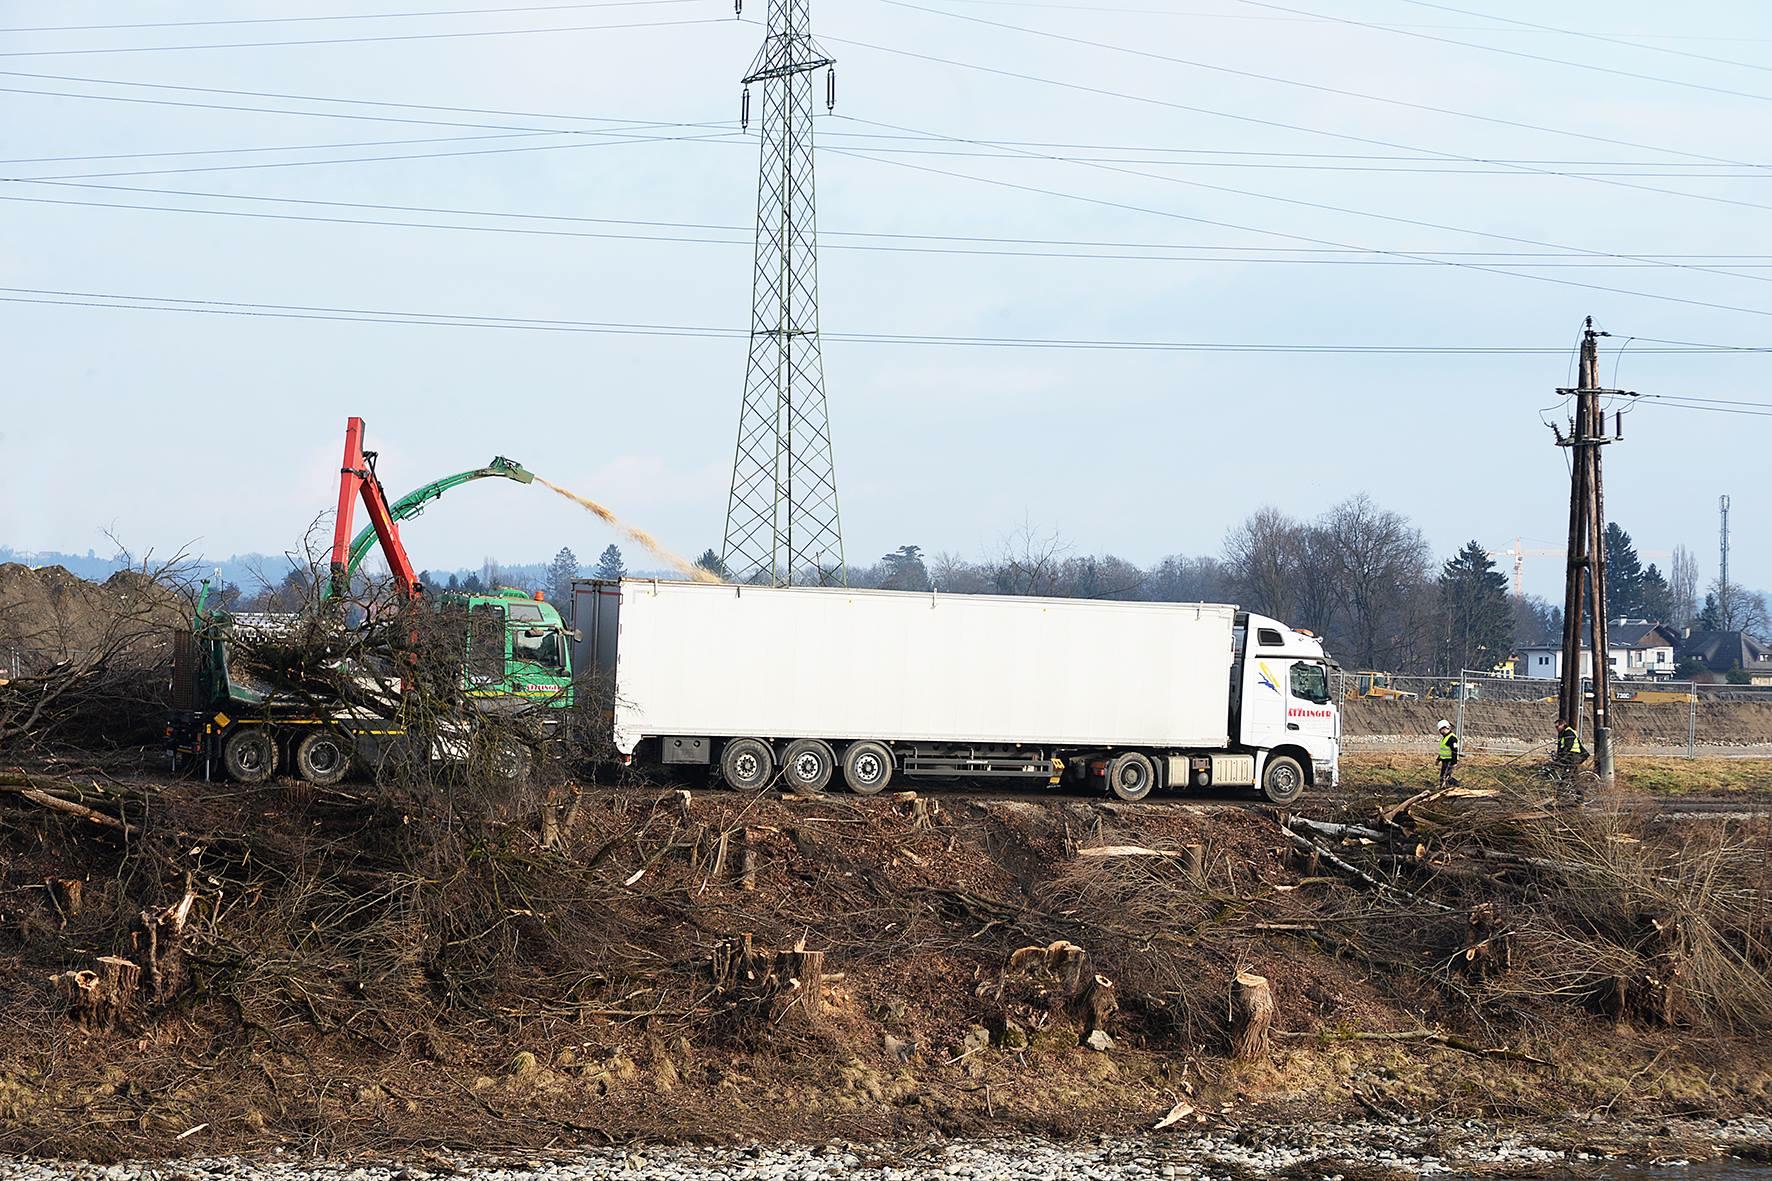 Petition gegen Wasserkraftwerk: Baum Rodung Petition gegen Wasserkraft Mur Graz